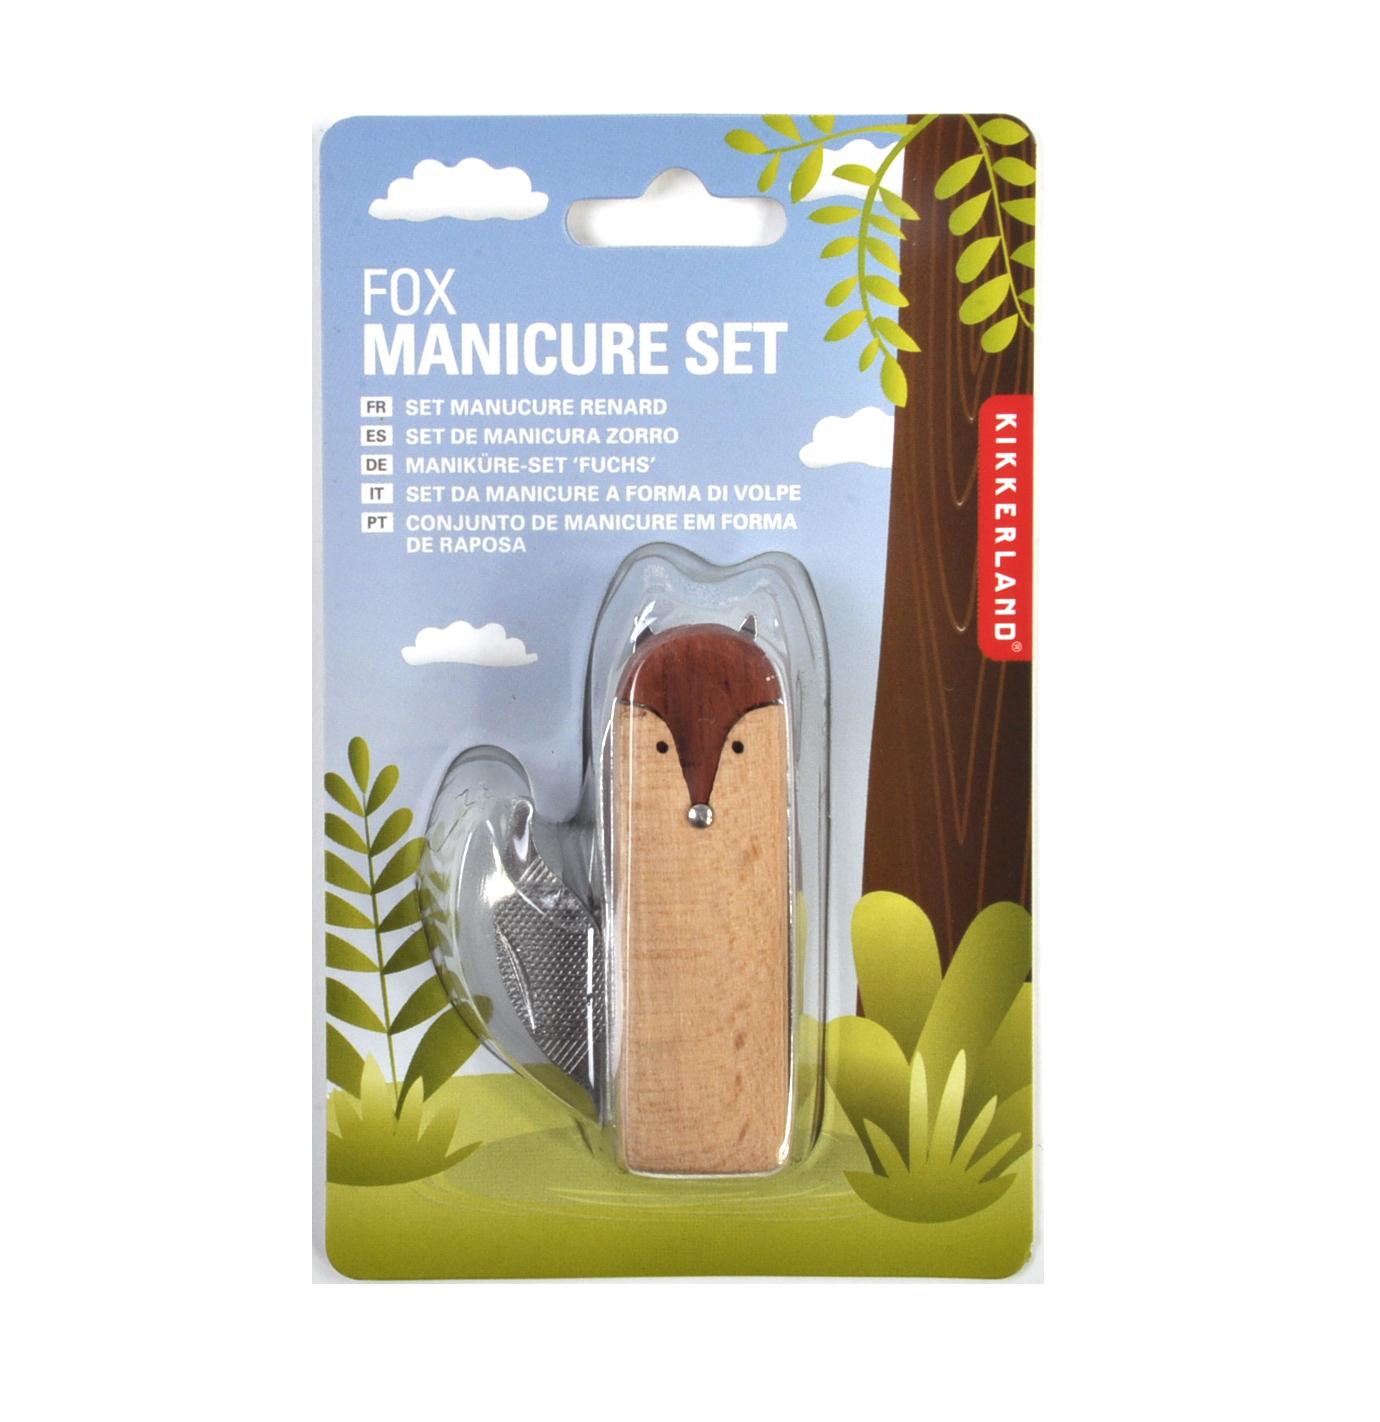 Fox Manicure Nail Clipper Set | Pink Cat Shop